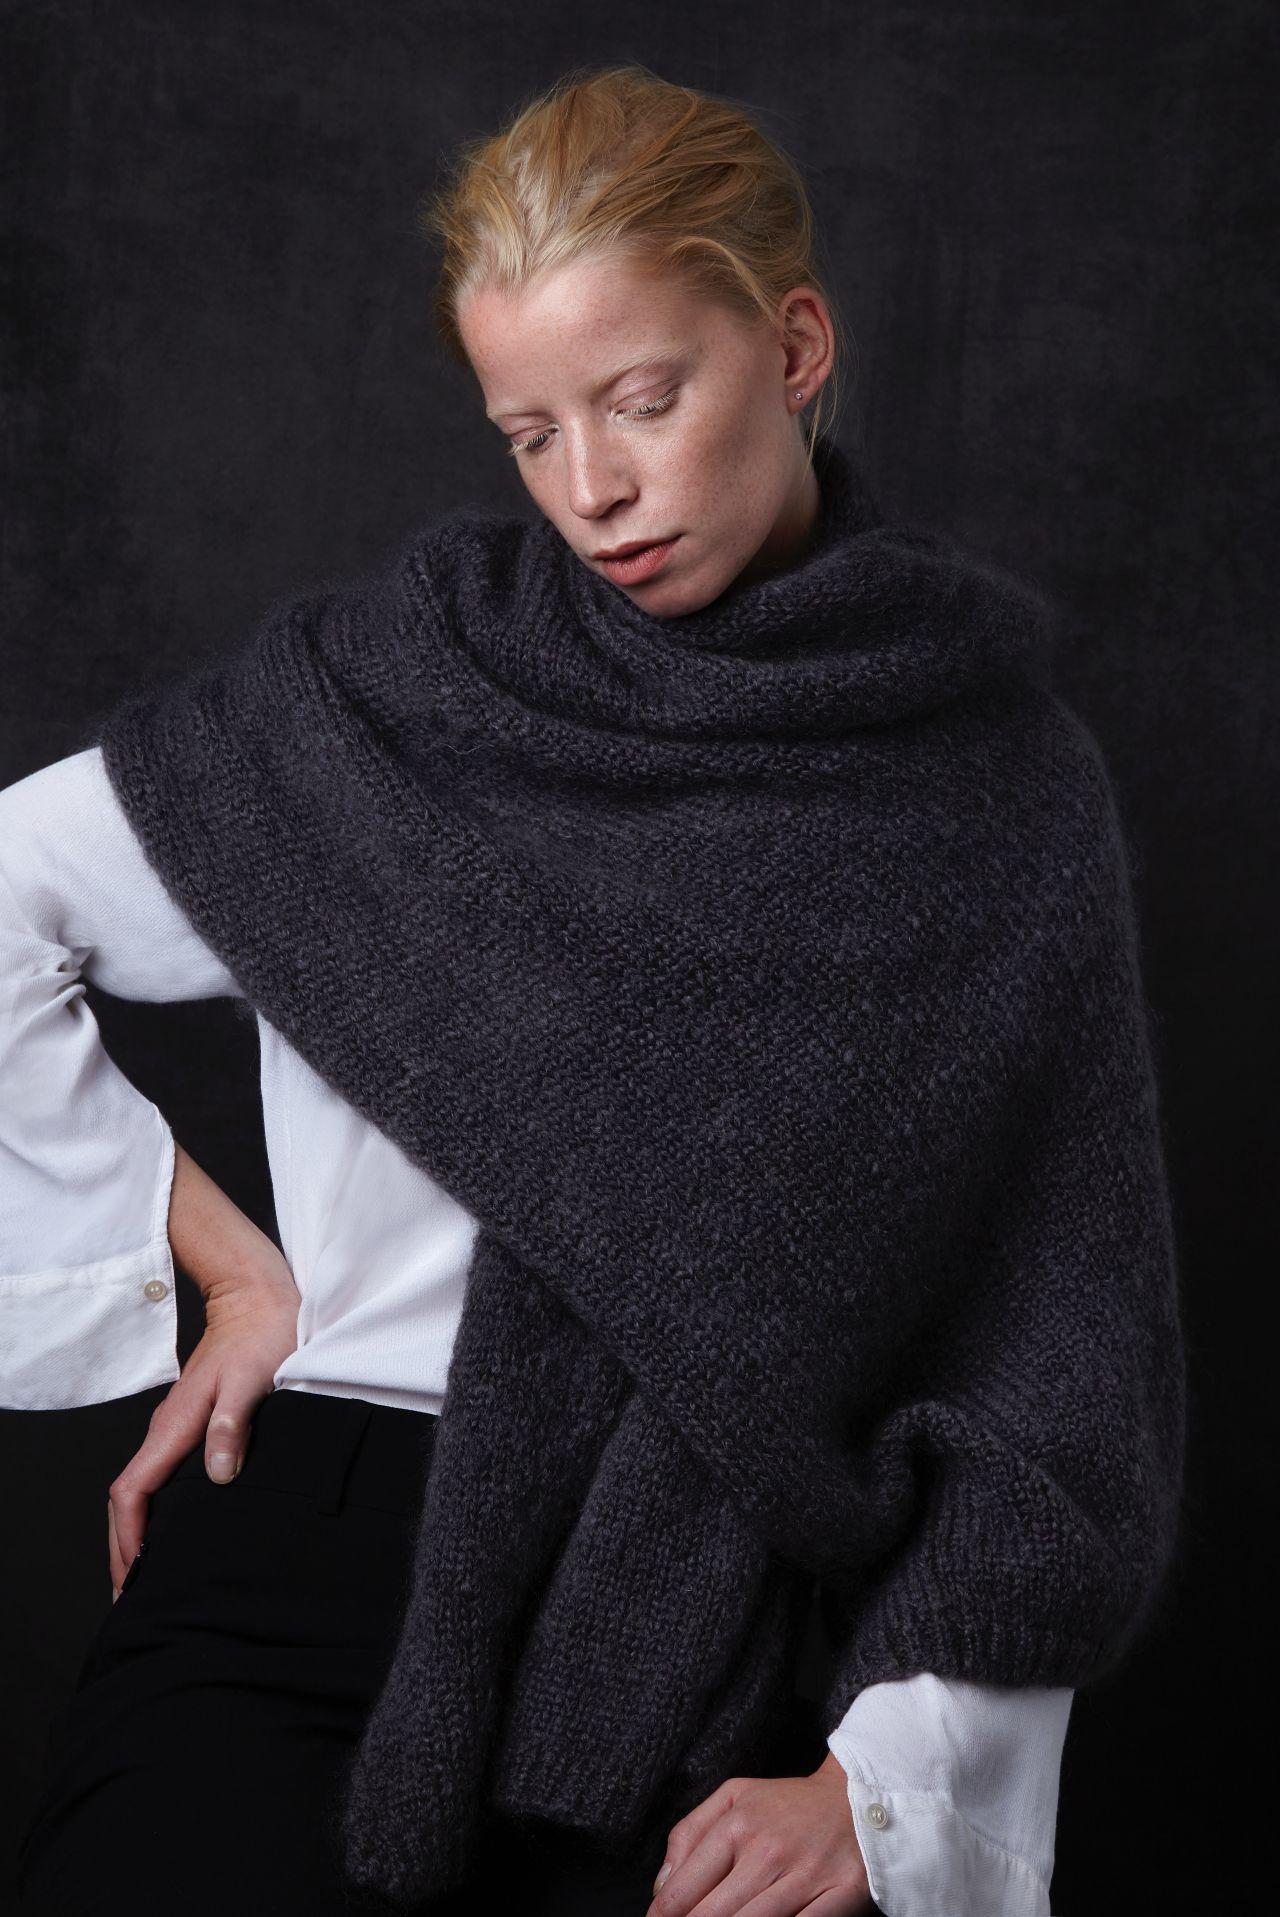 Juul mohair wool dark gray shawl from Dutch goats detail.